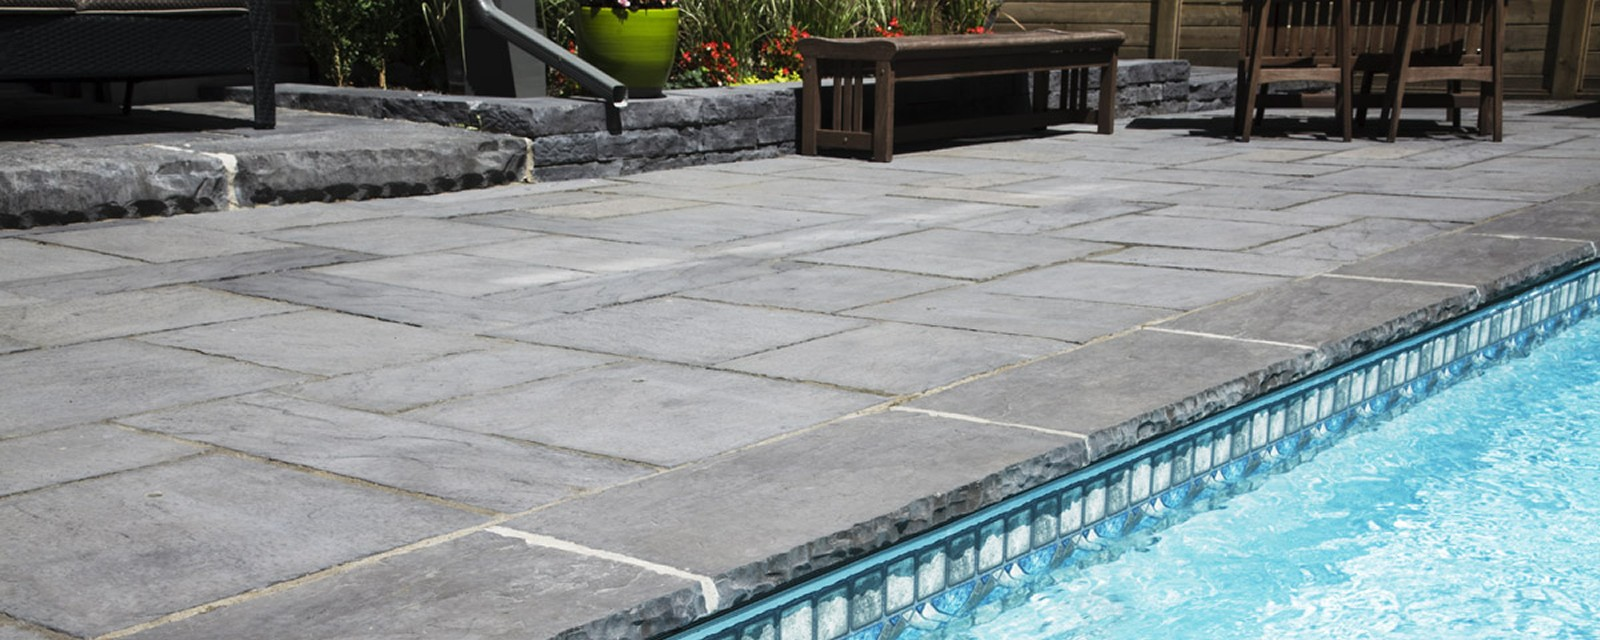 Grey Stamped Concrete Patio